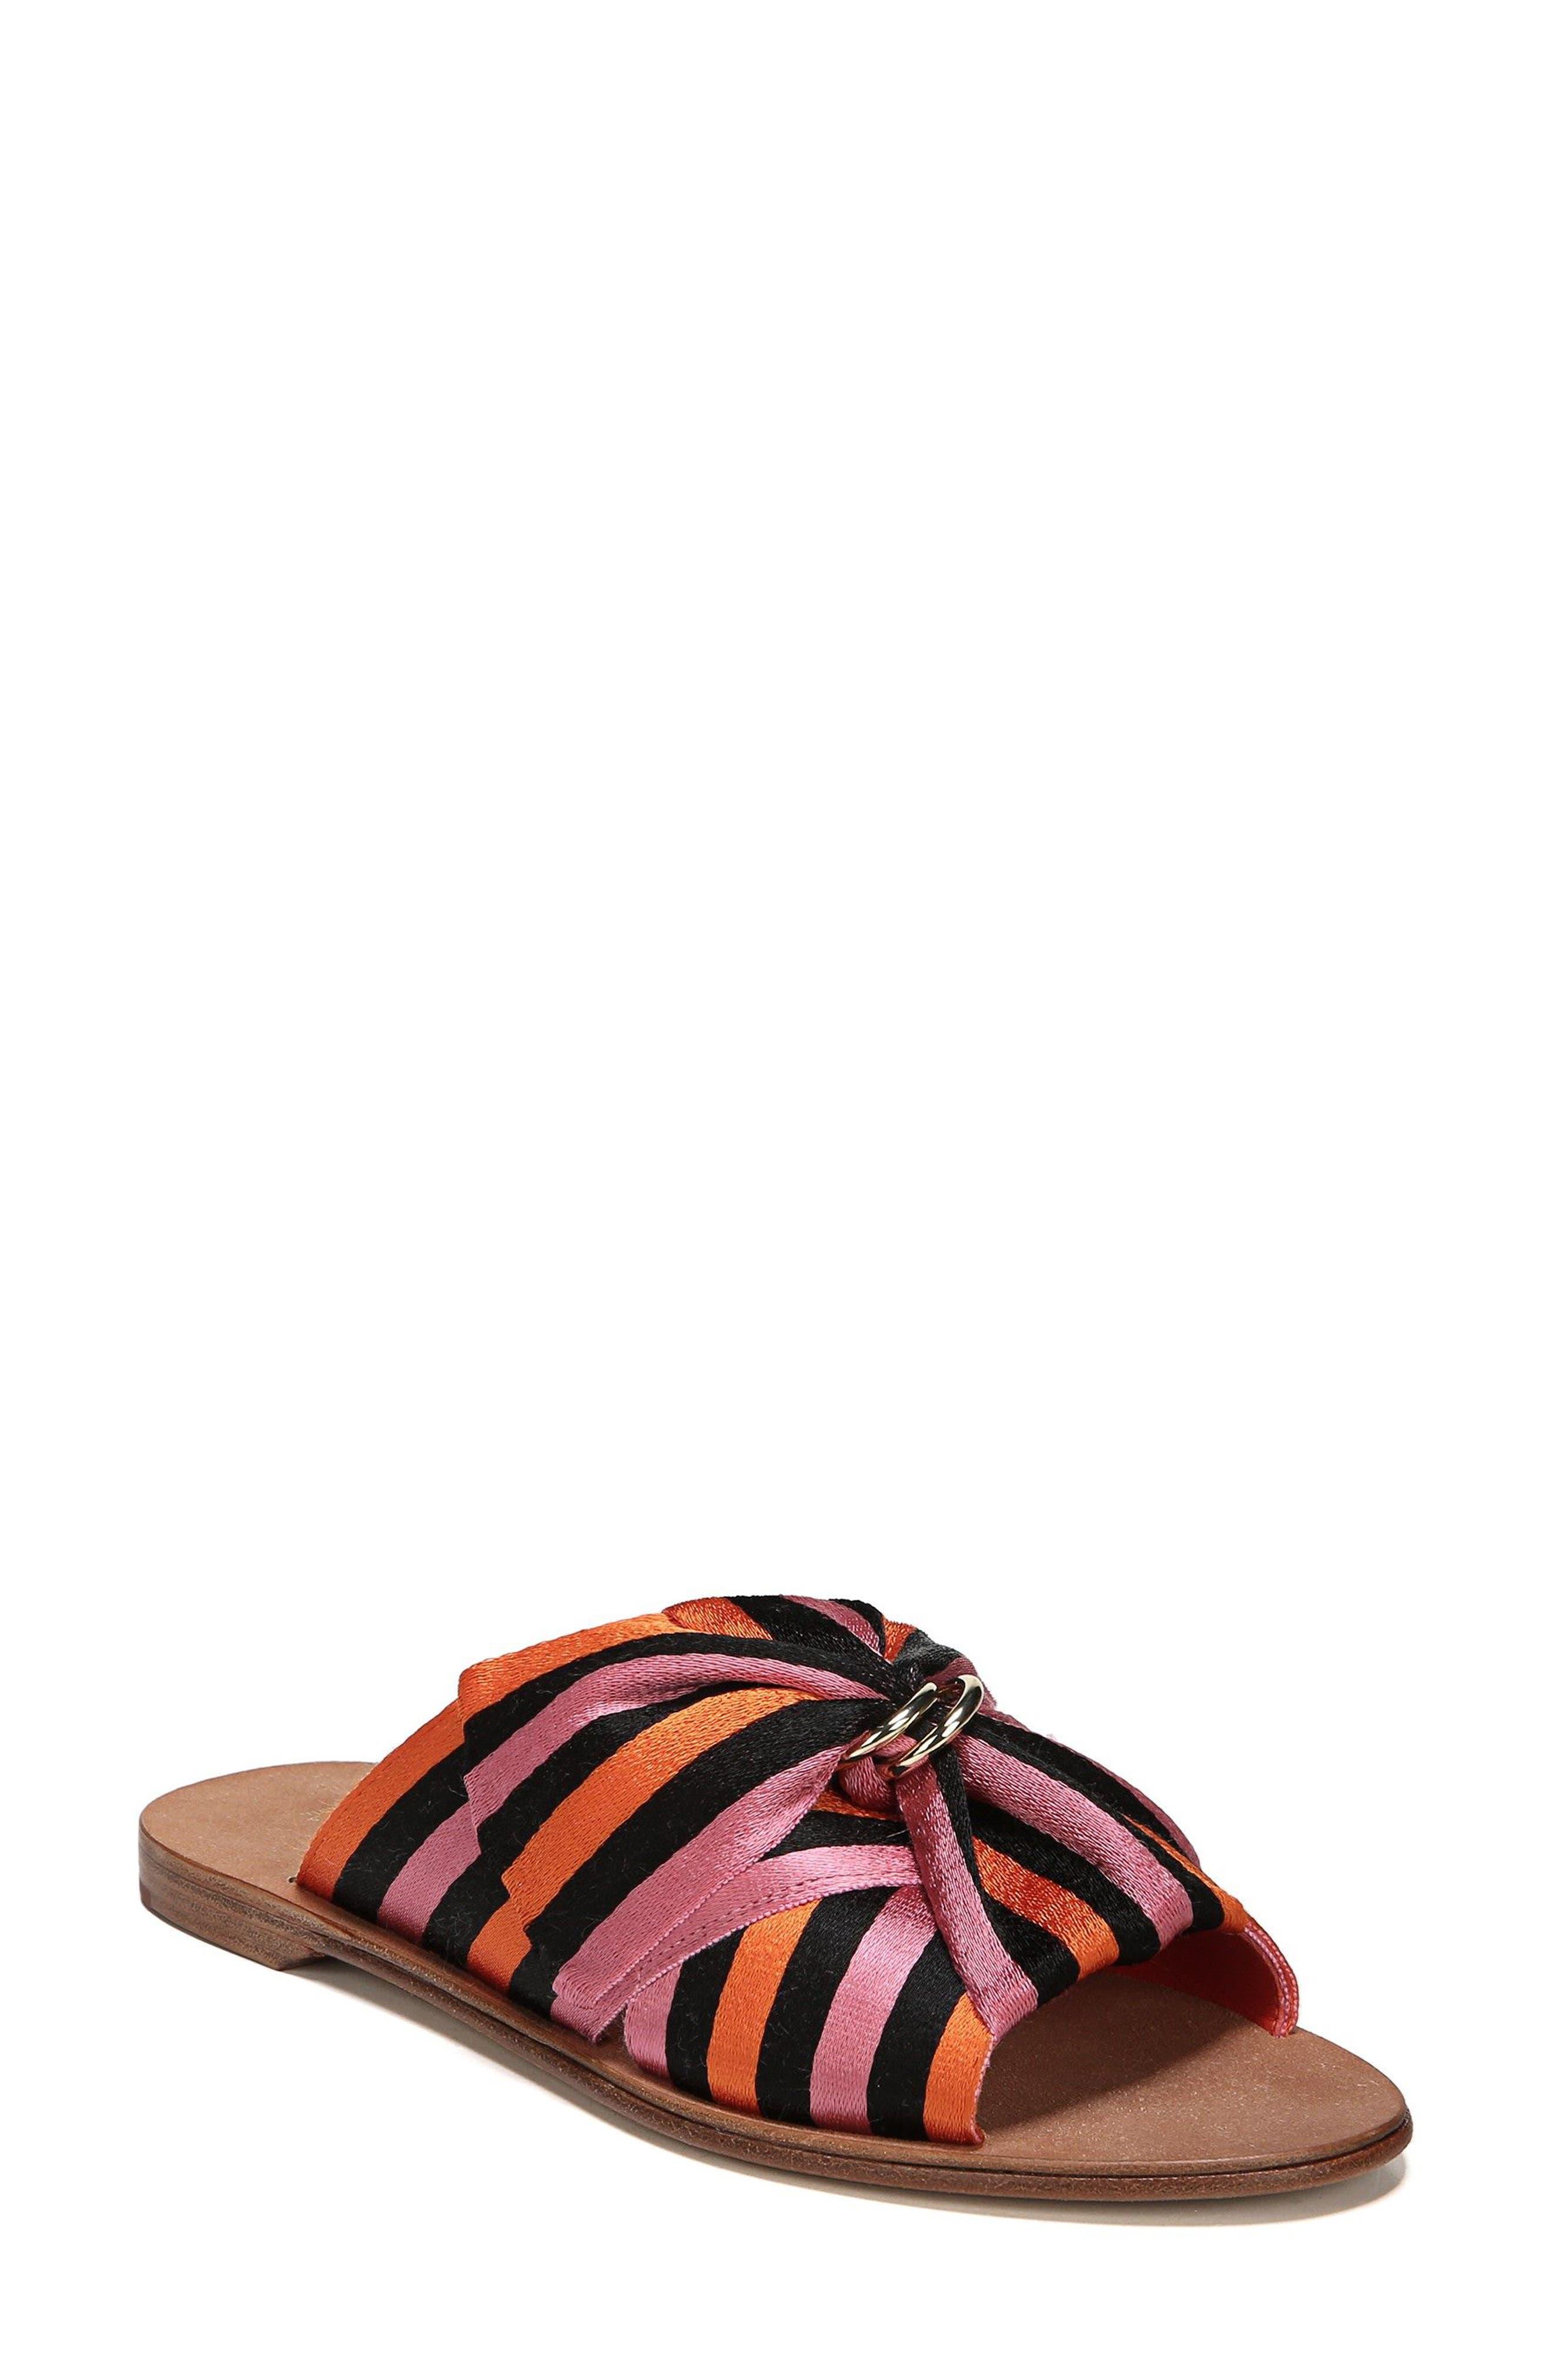 Bella Asymmetrical Slide Sandal,                             Main thumbnail 1, color,                             Rose Multi